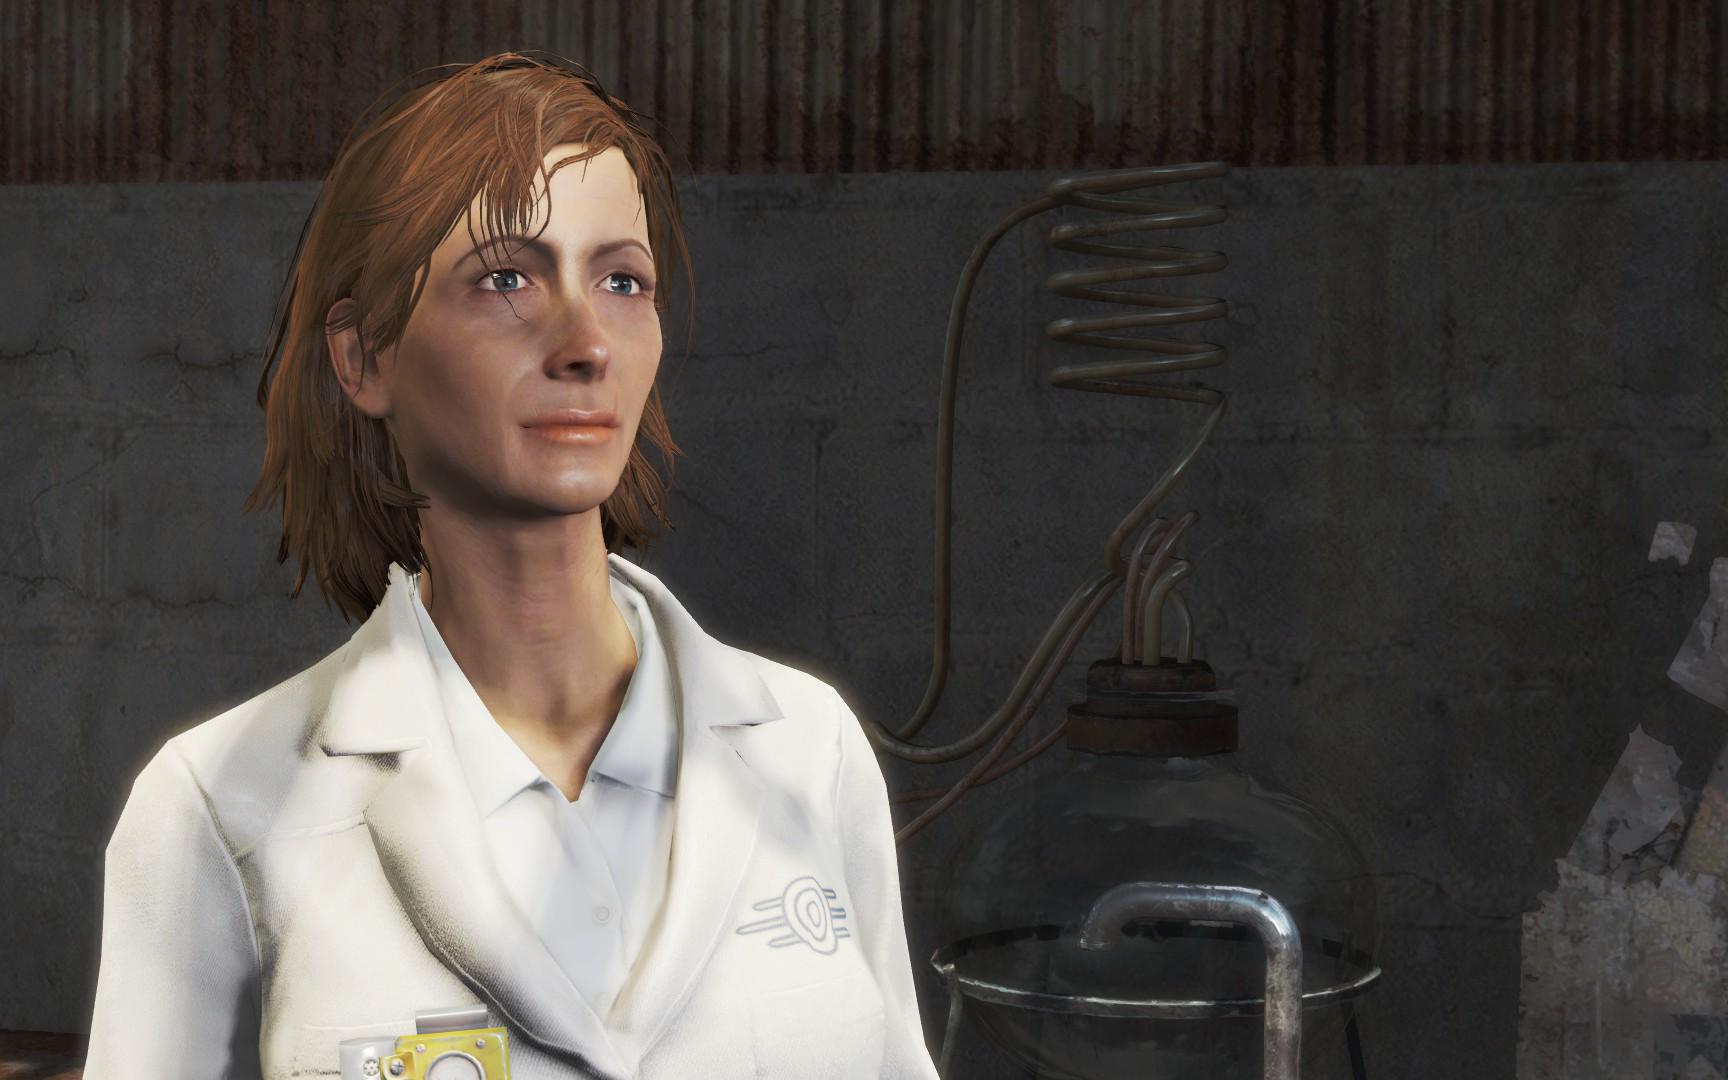 Doctor Duff